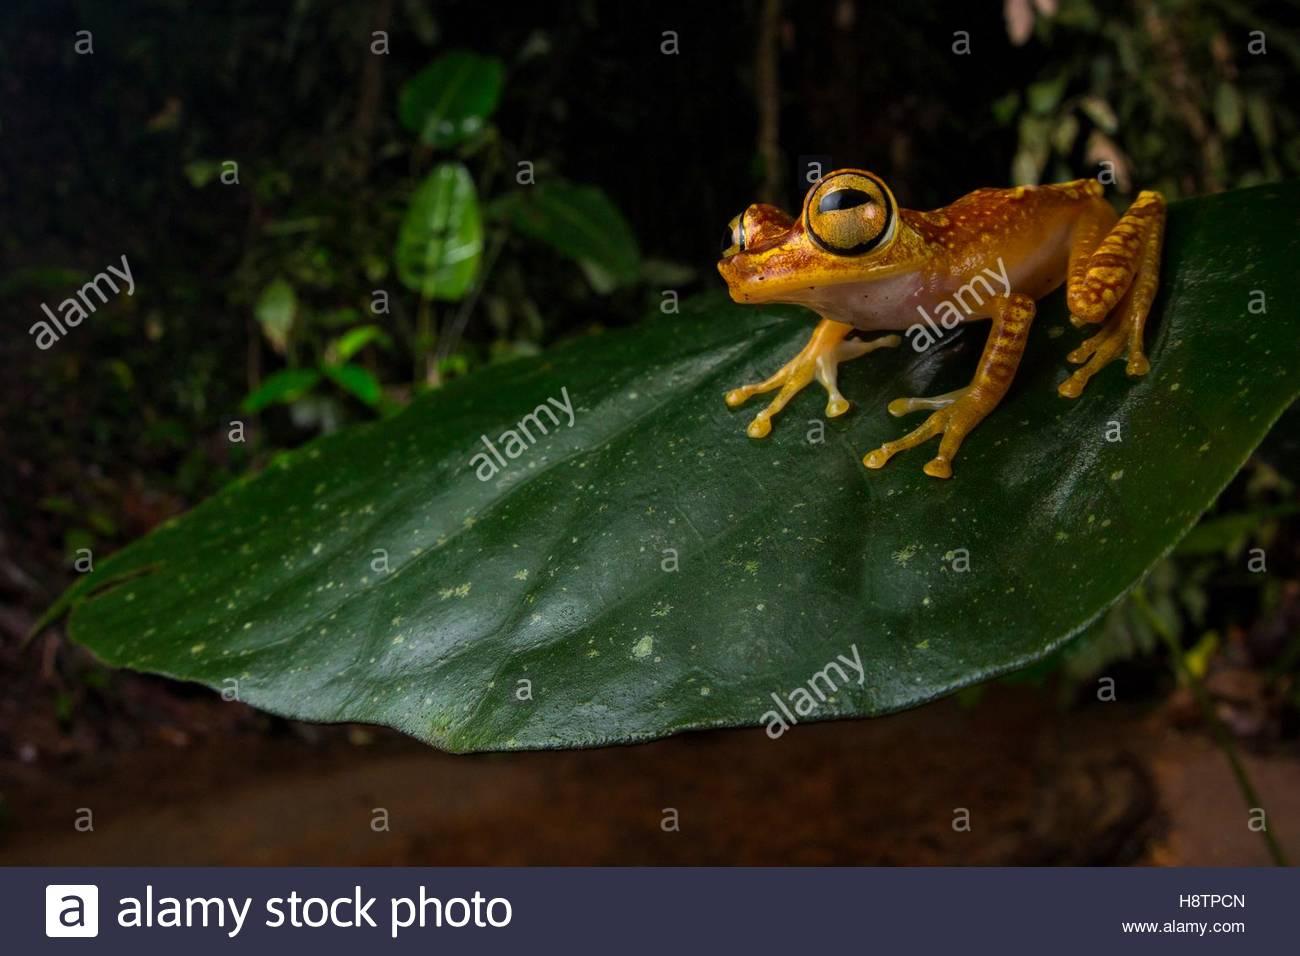 imbabura tree frog hypsiboas picturatus puerto quito ecuador